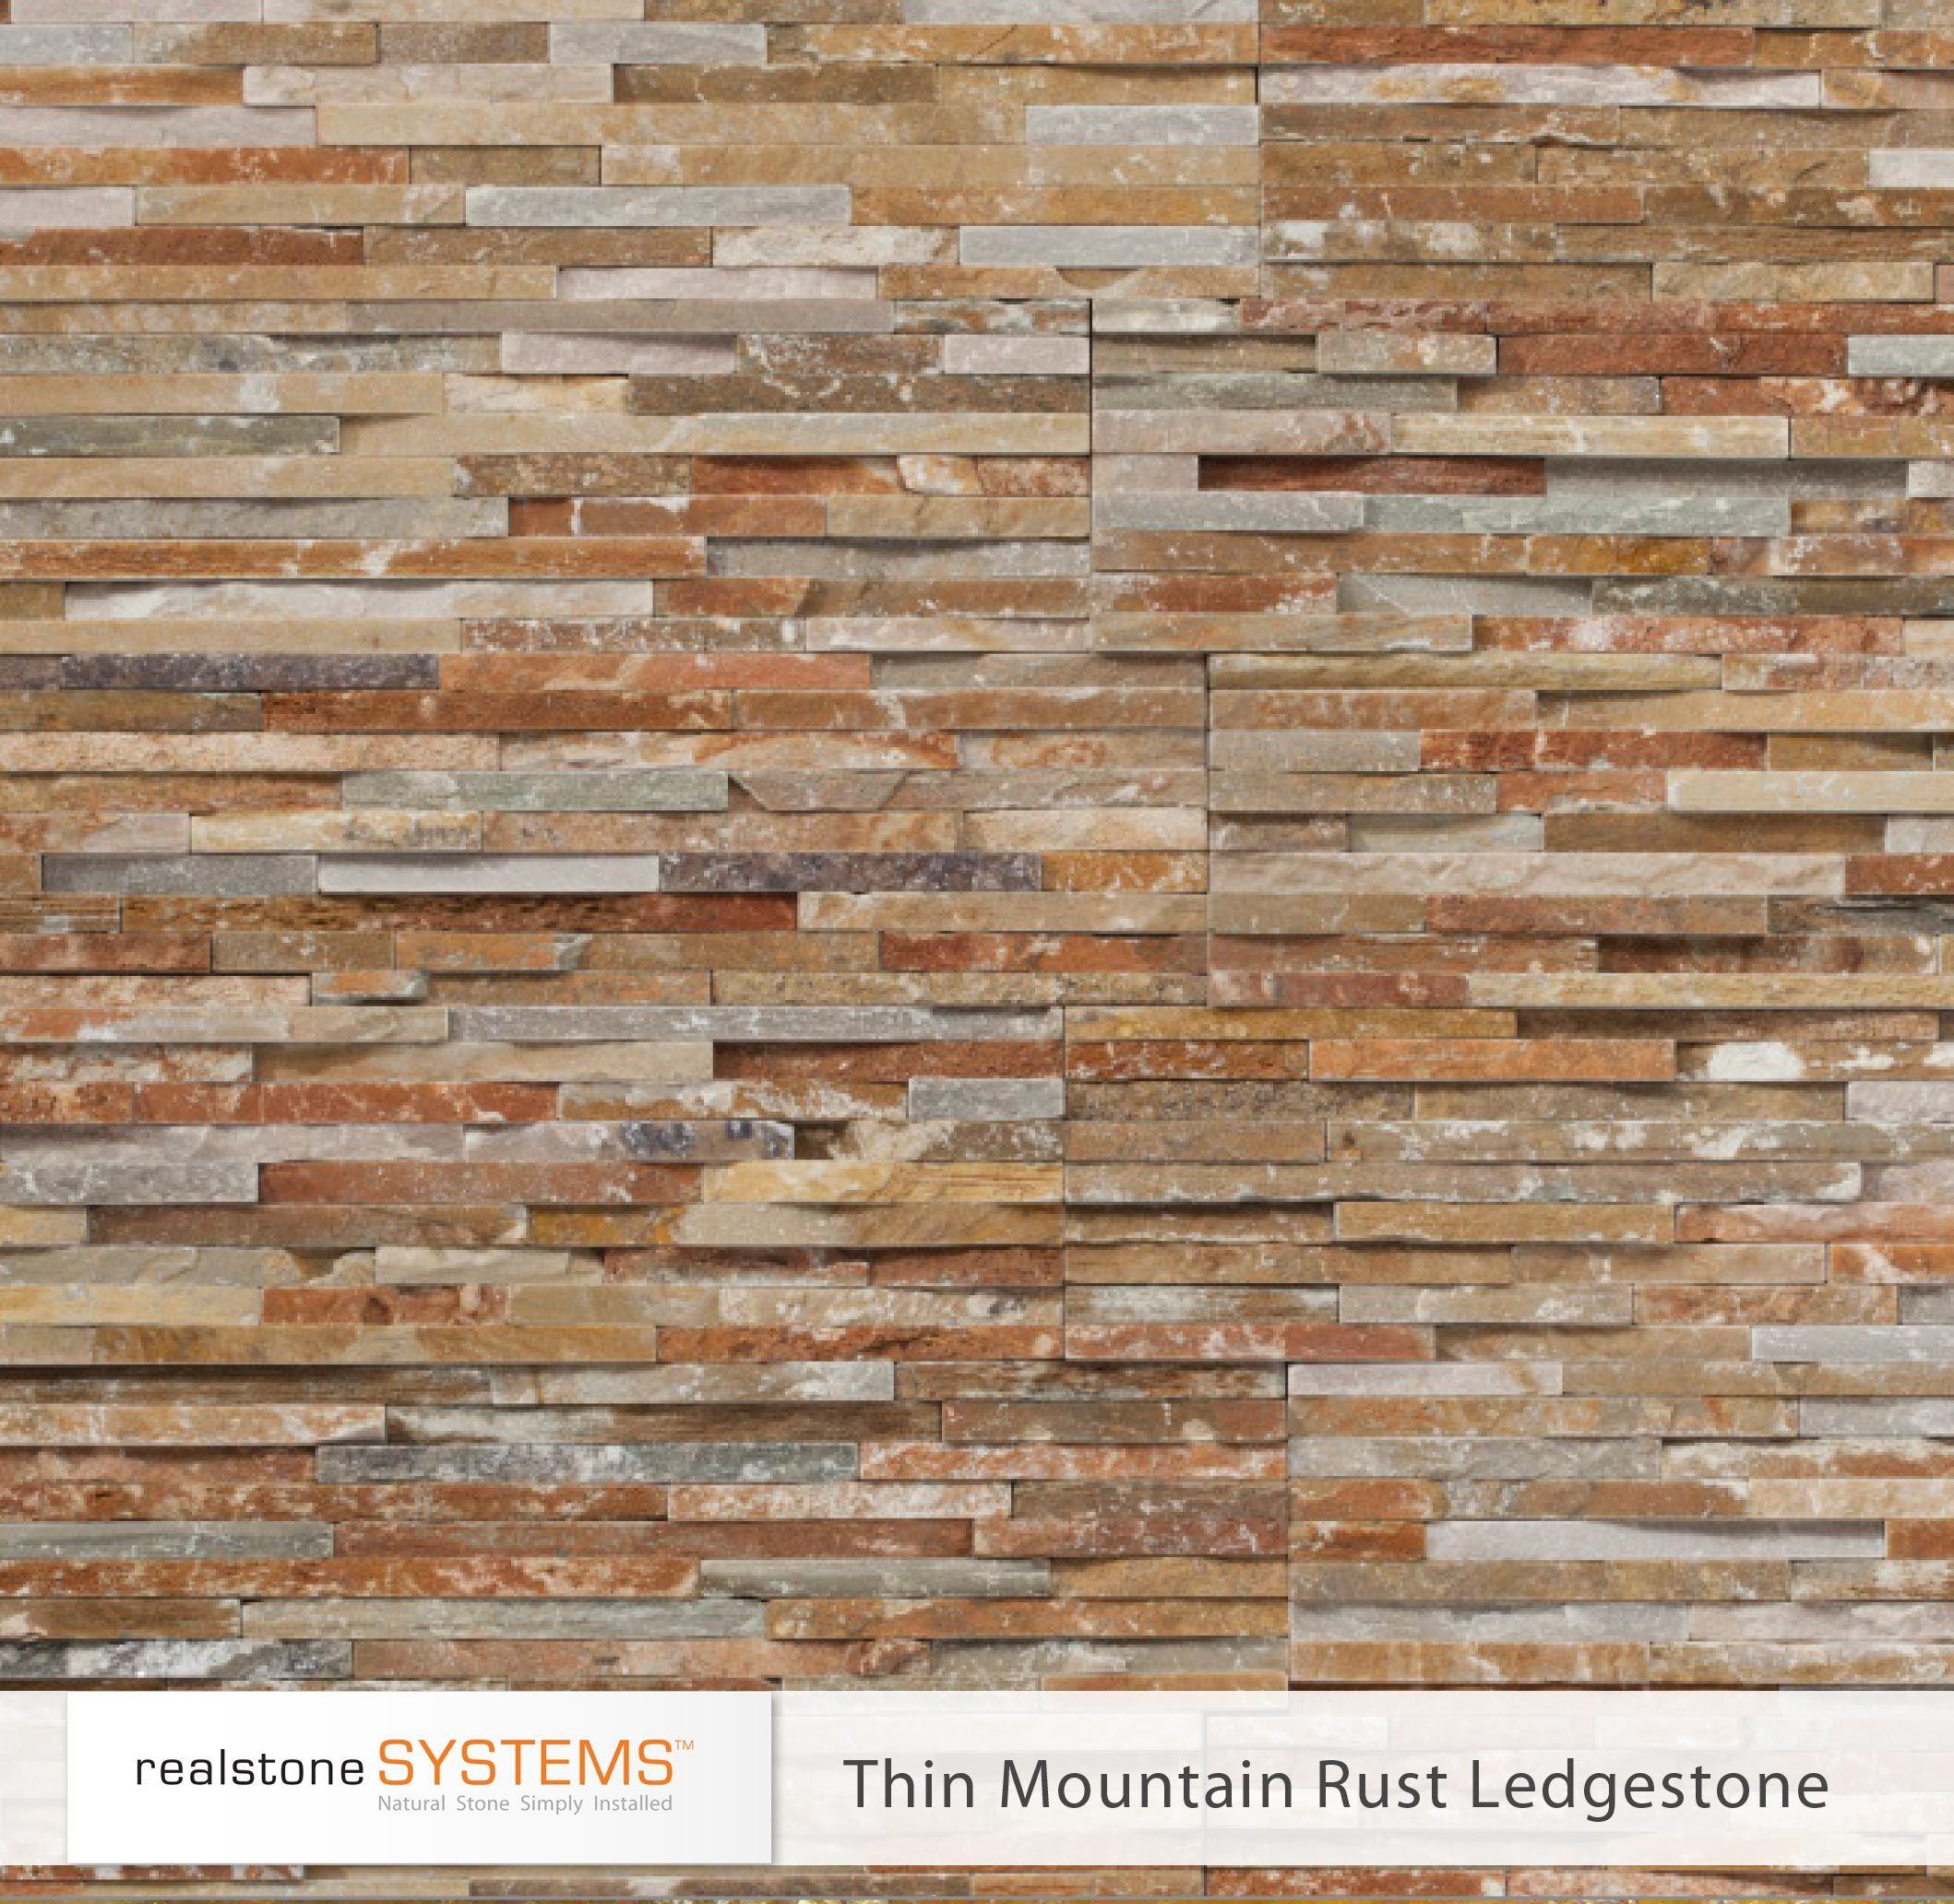 Thin Mountain Rust Ledgestone Thinstone Veneers From